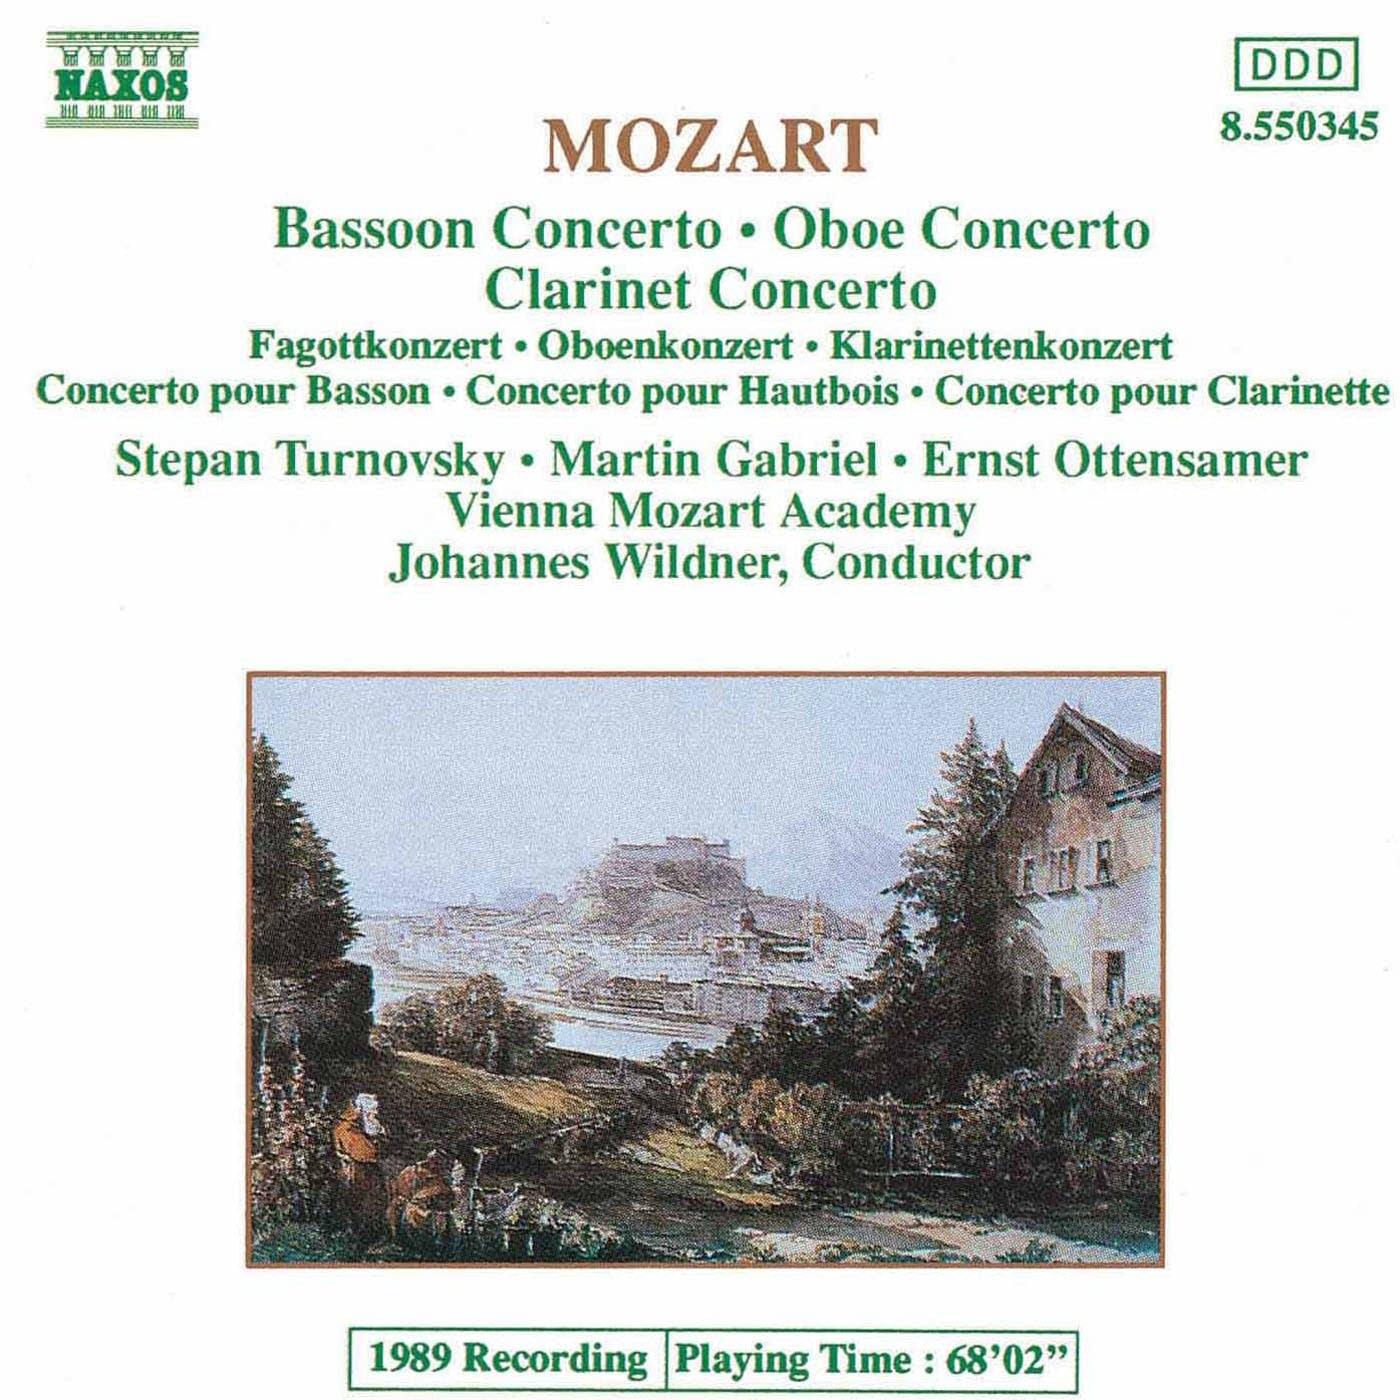 Wolfgang Amadeus Mozart - Oboe Concerto: I. Allegro aperto